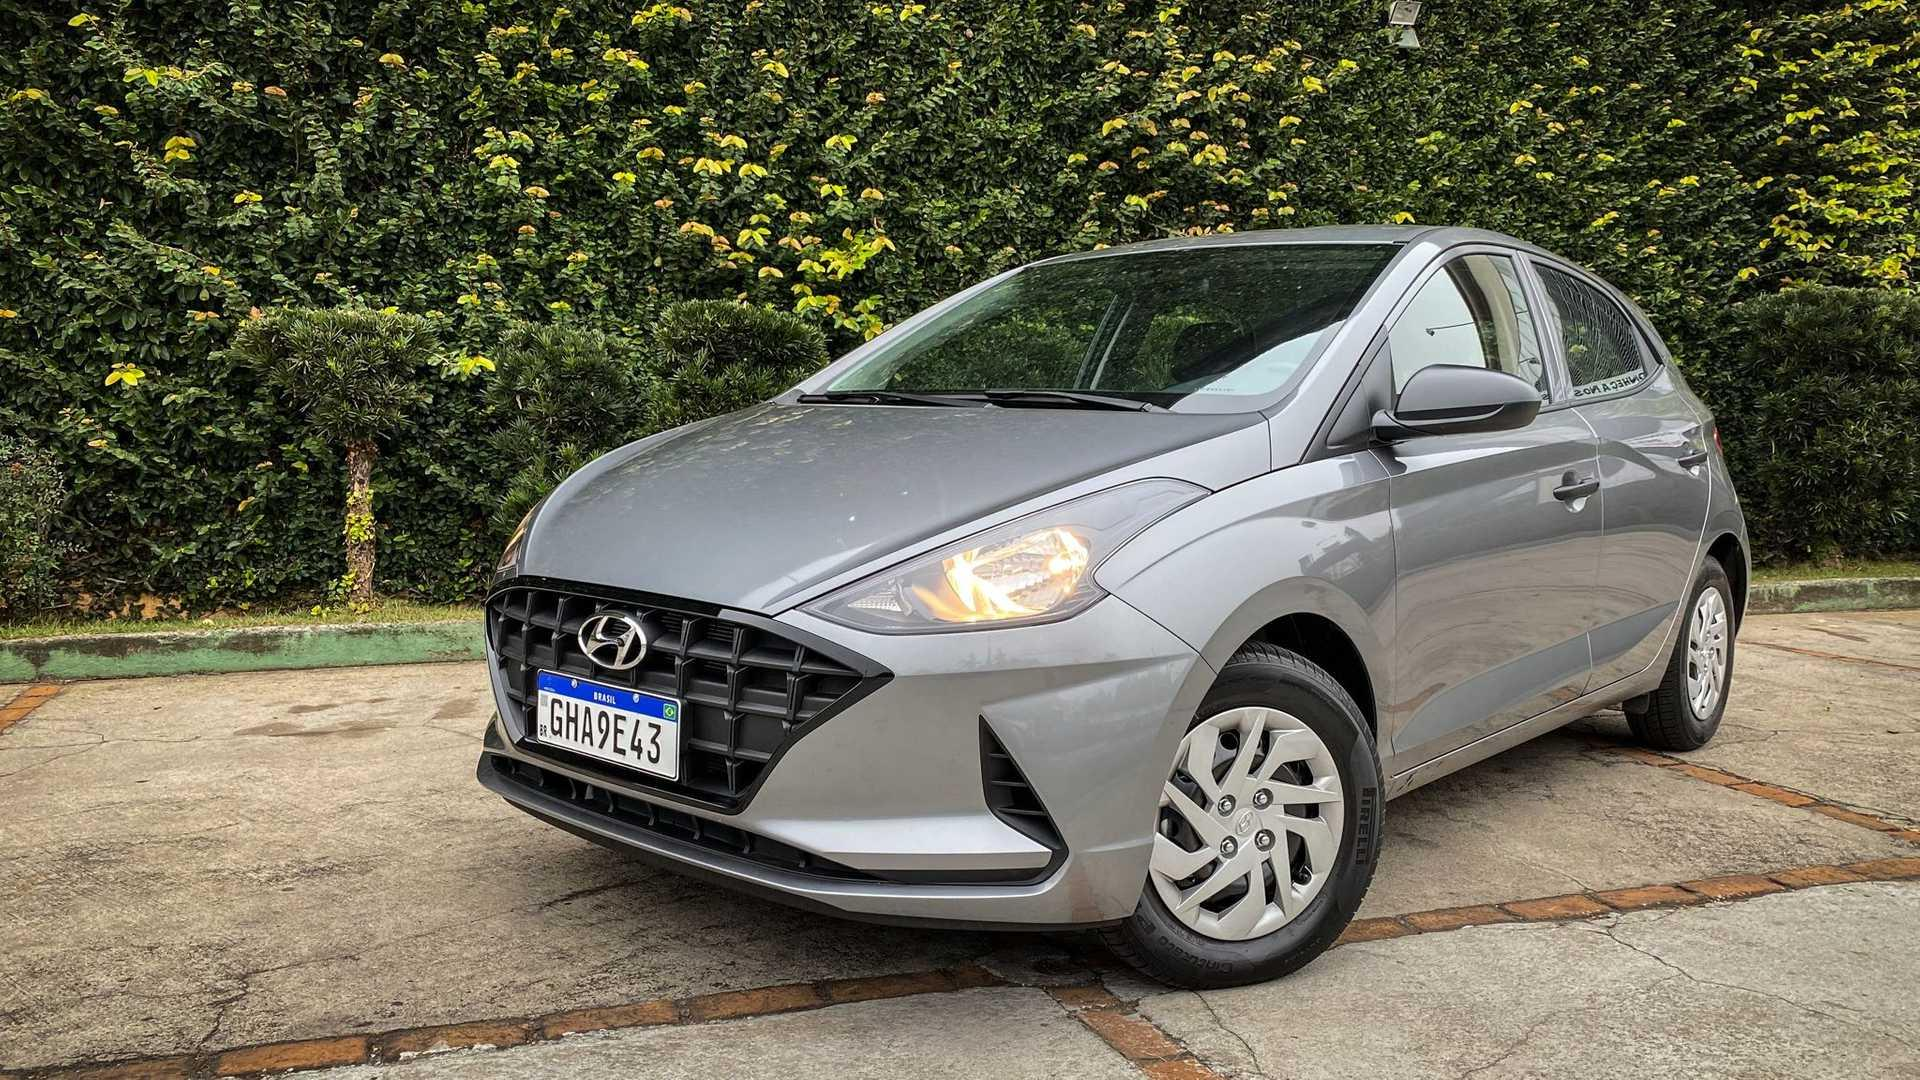 Teste: Hyundai HB20 1.0 Sense 2021 acerta custo-benefício ...